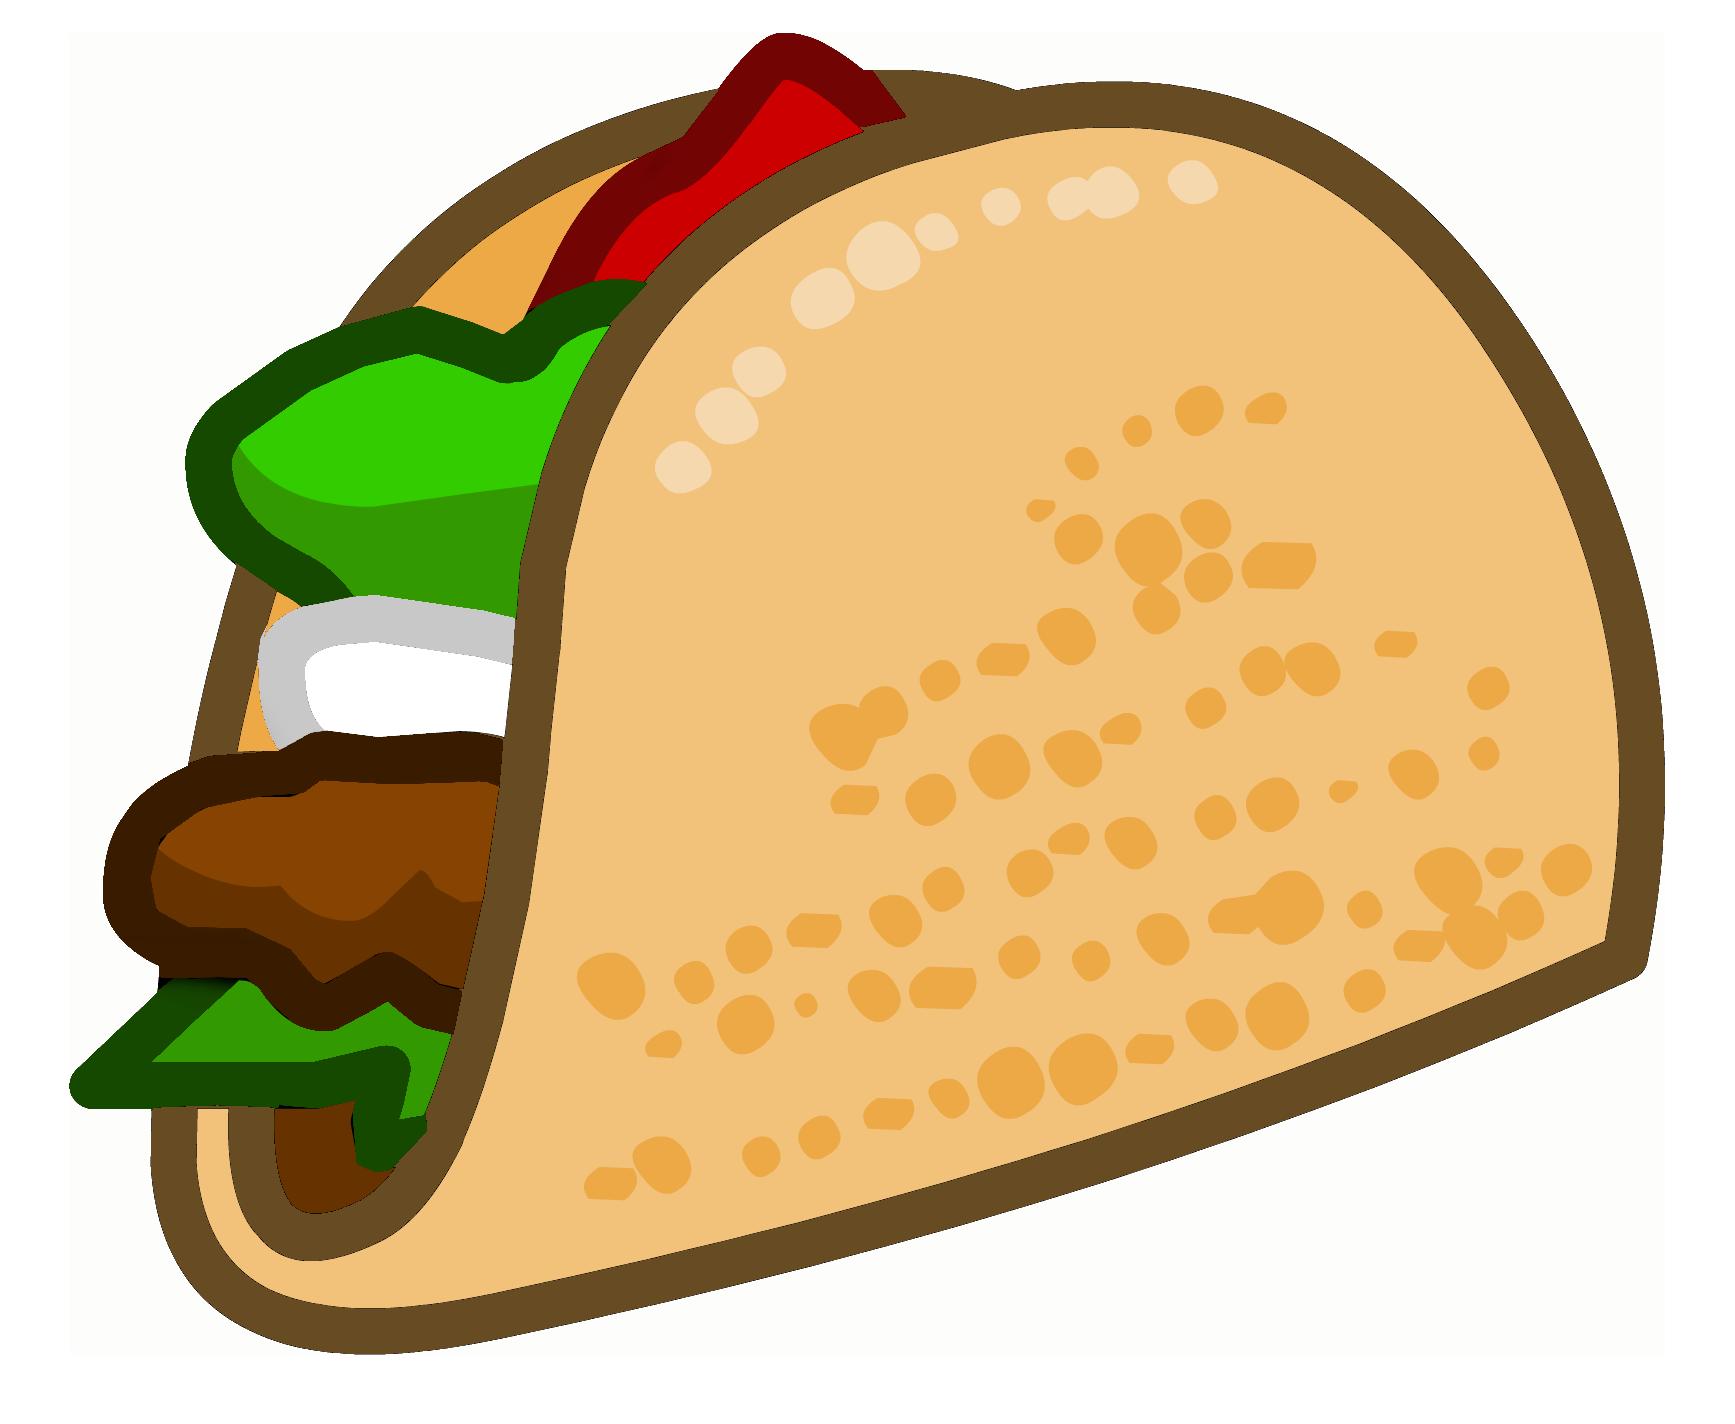 1735x1424 Taco Clipart Free Clip Art Images 3 Image